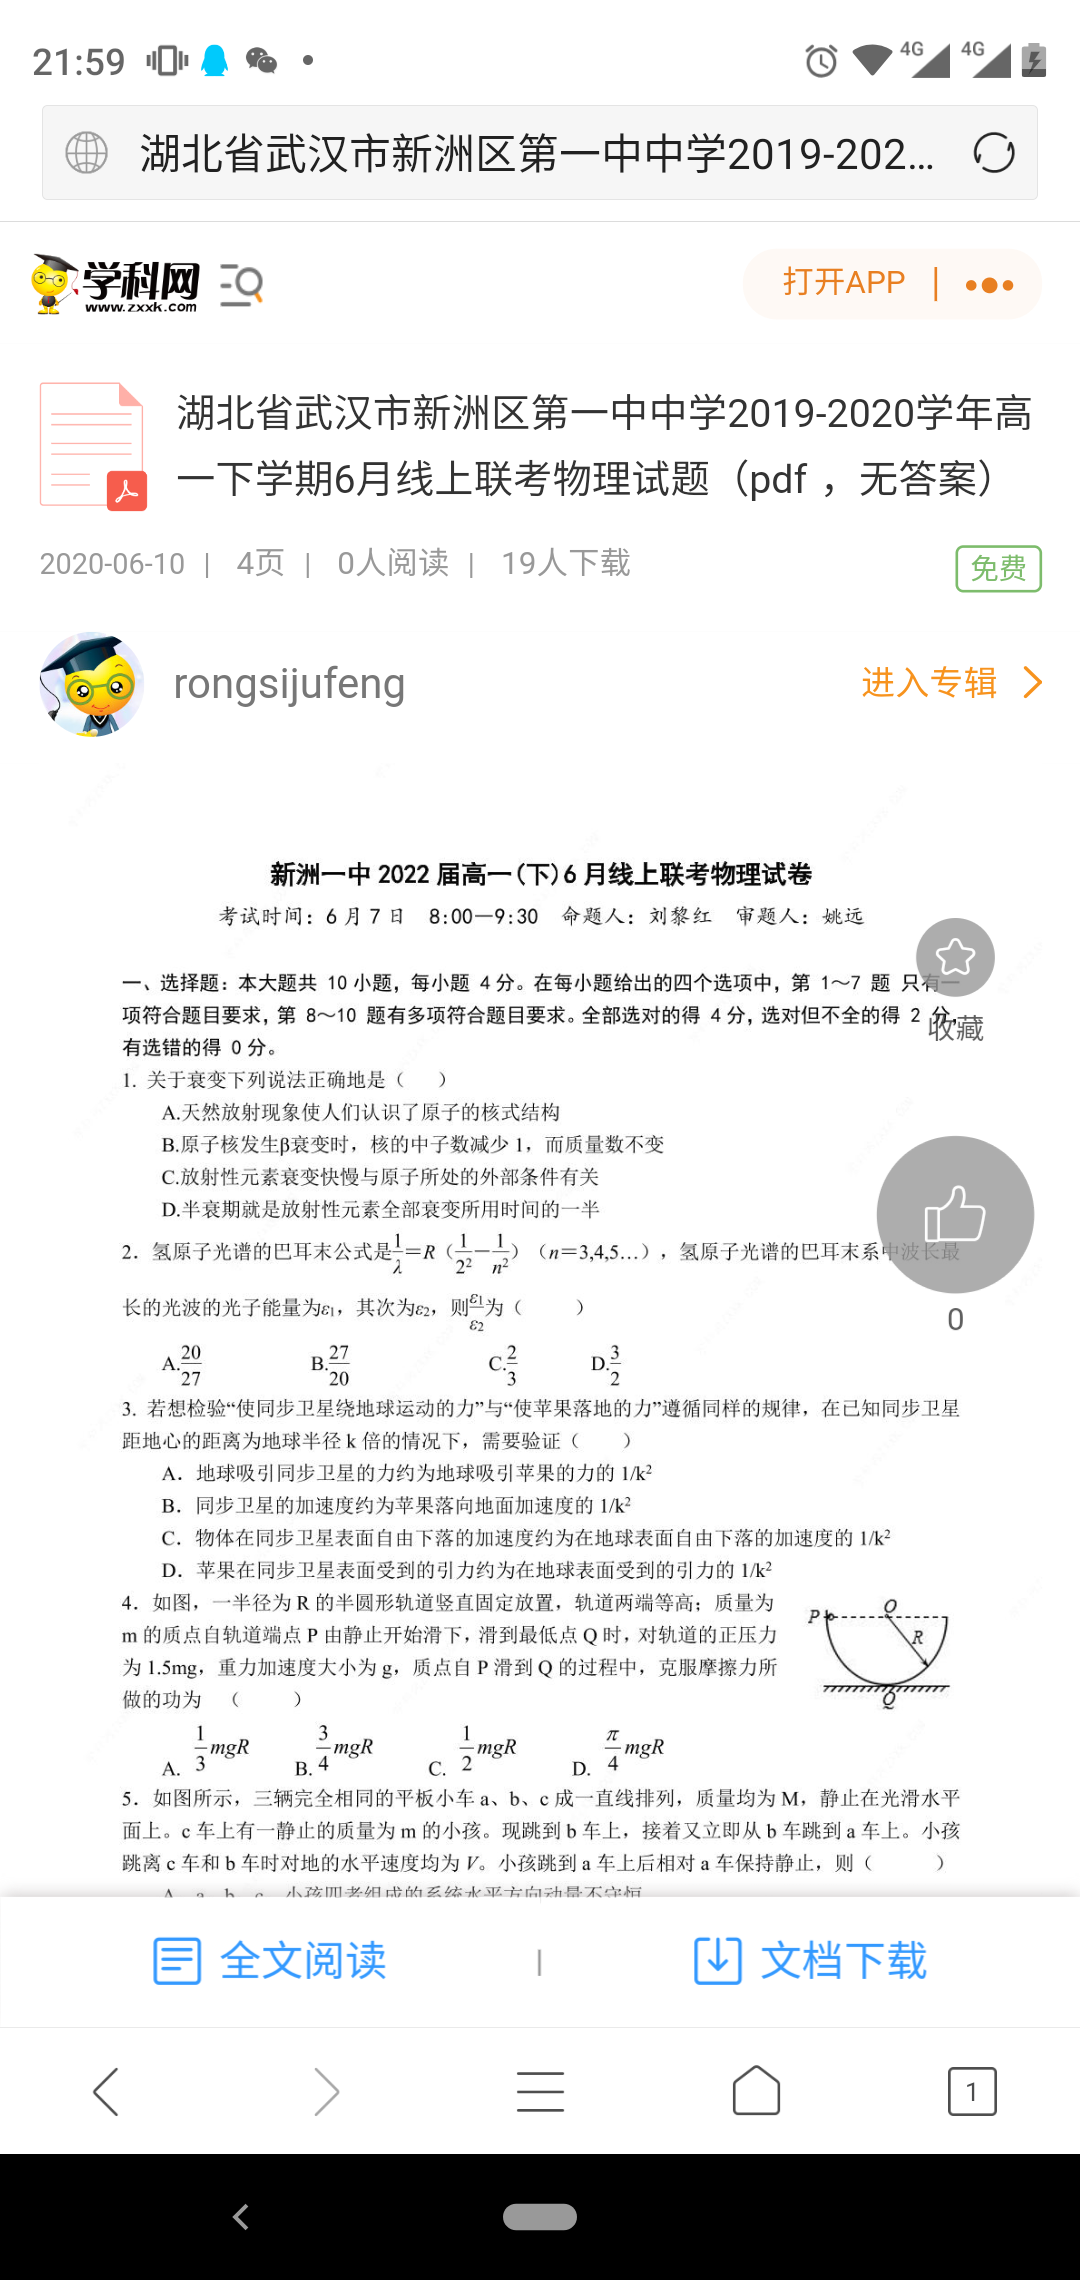 Screenshot_2020-06-26-21-59-42.png